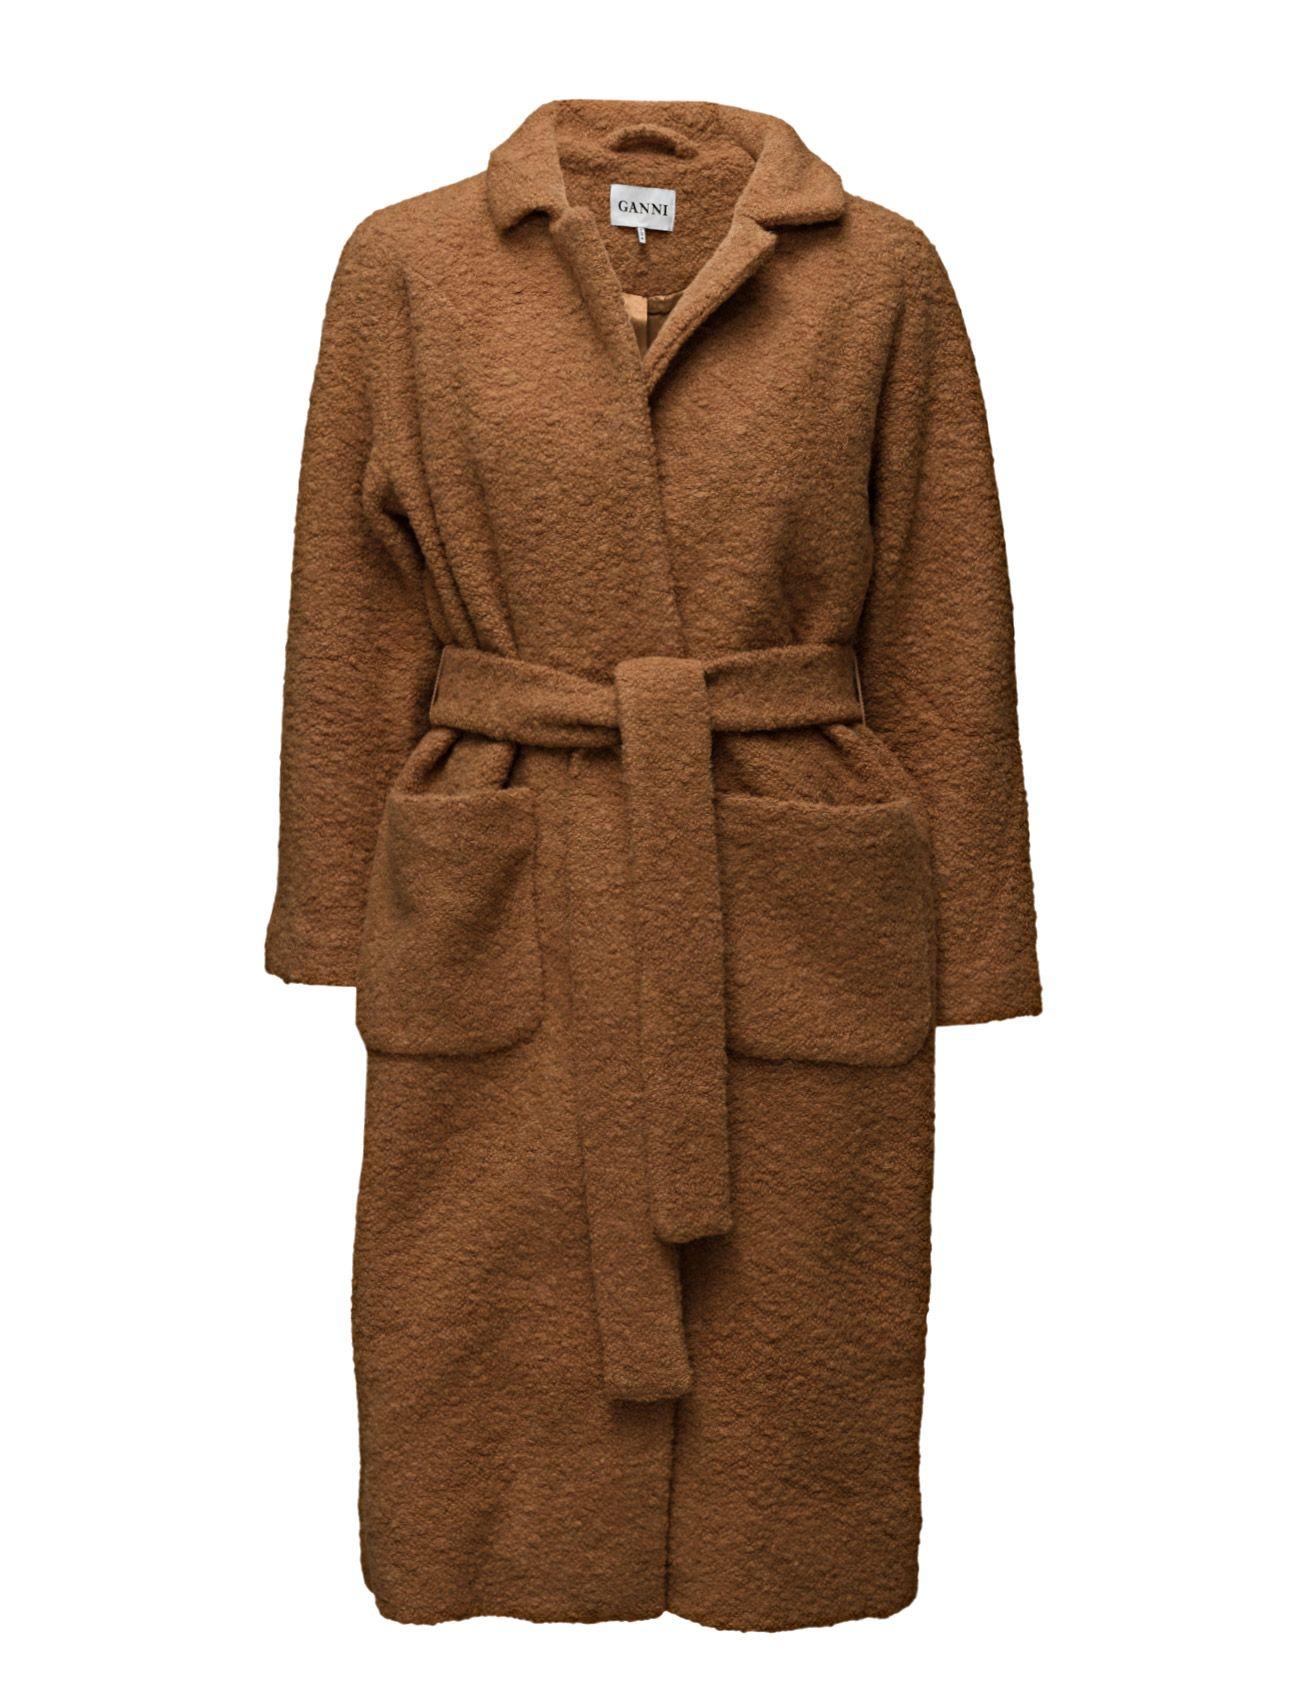 b7426687 Nye styles hver dag - shop nu | Wear | Fashion, How to wear, Style